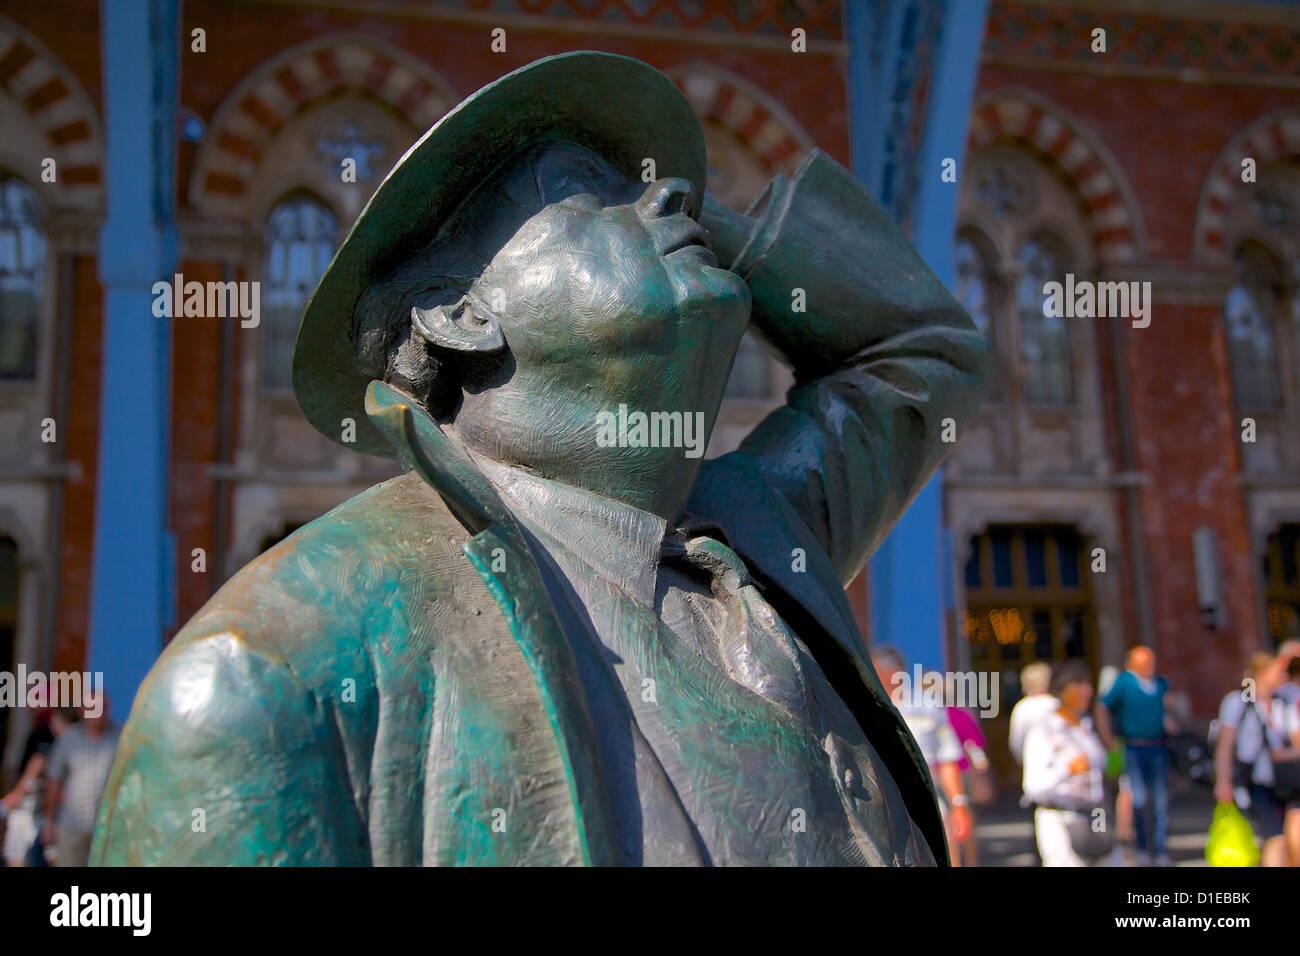 Statue of John Betjeman, St. Pancras International Station, London, England, United Kingdom, Europe - Stock Image